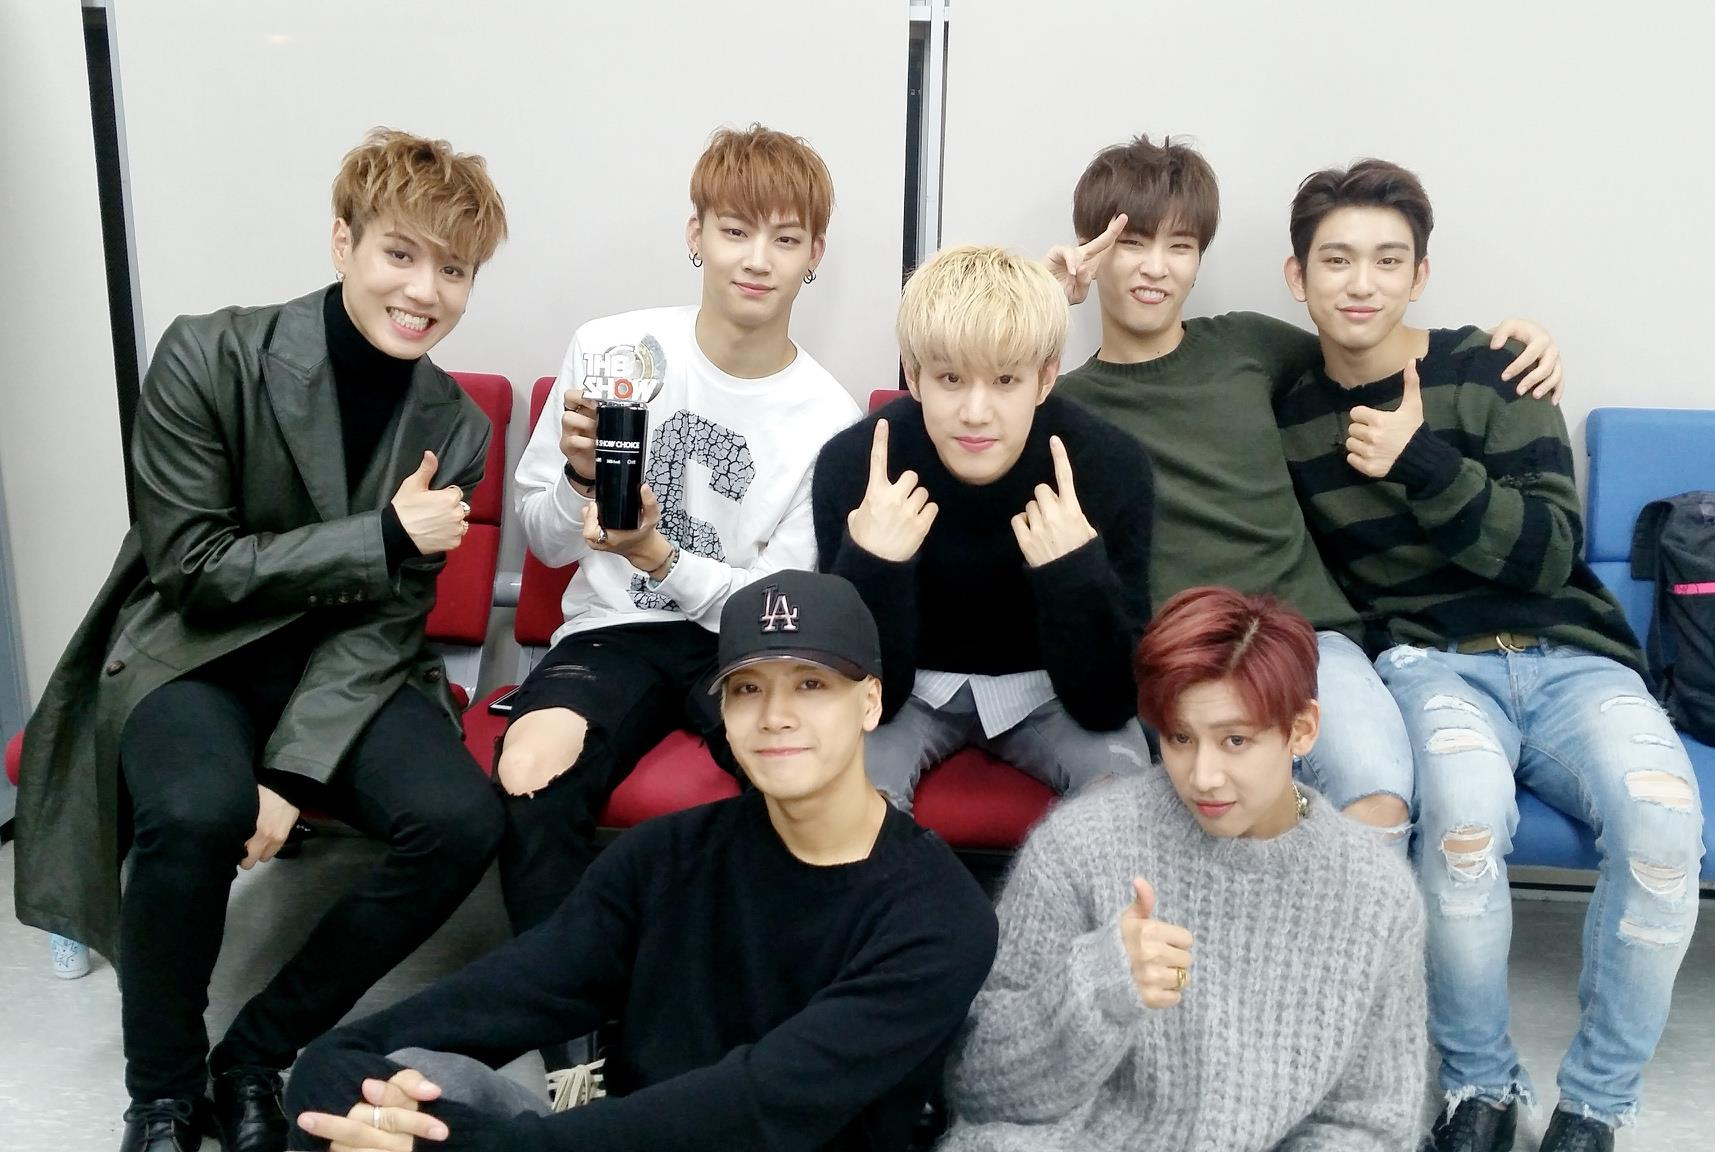 GOT7則是入圍最佳舞蹈表演男團與最佳年度歌曲《If You Do》,也會出席頒獎典禮